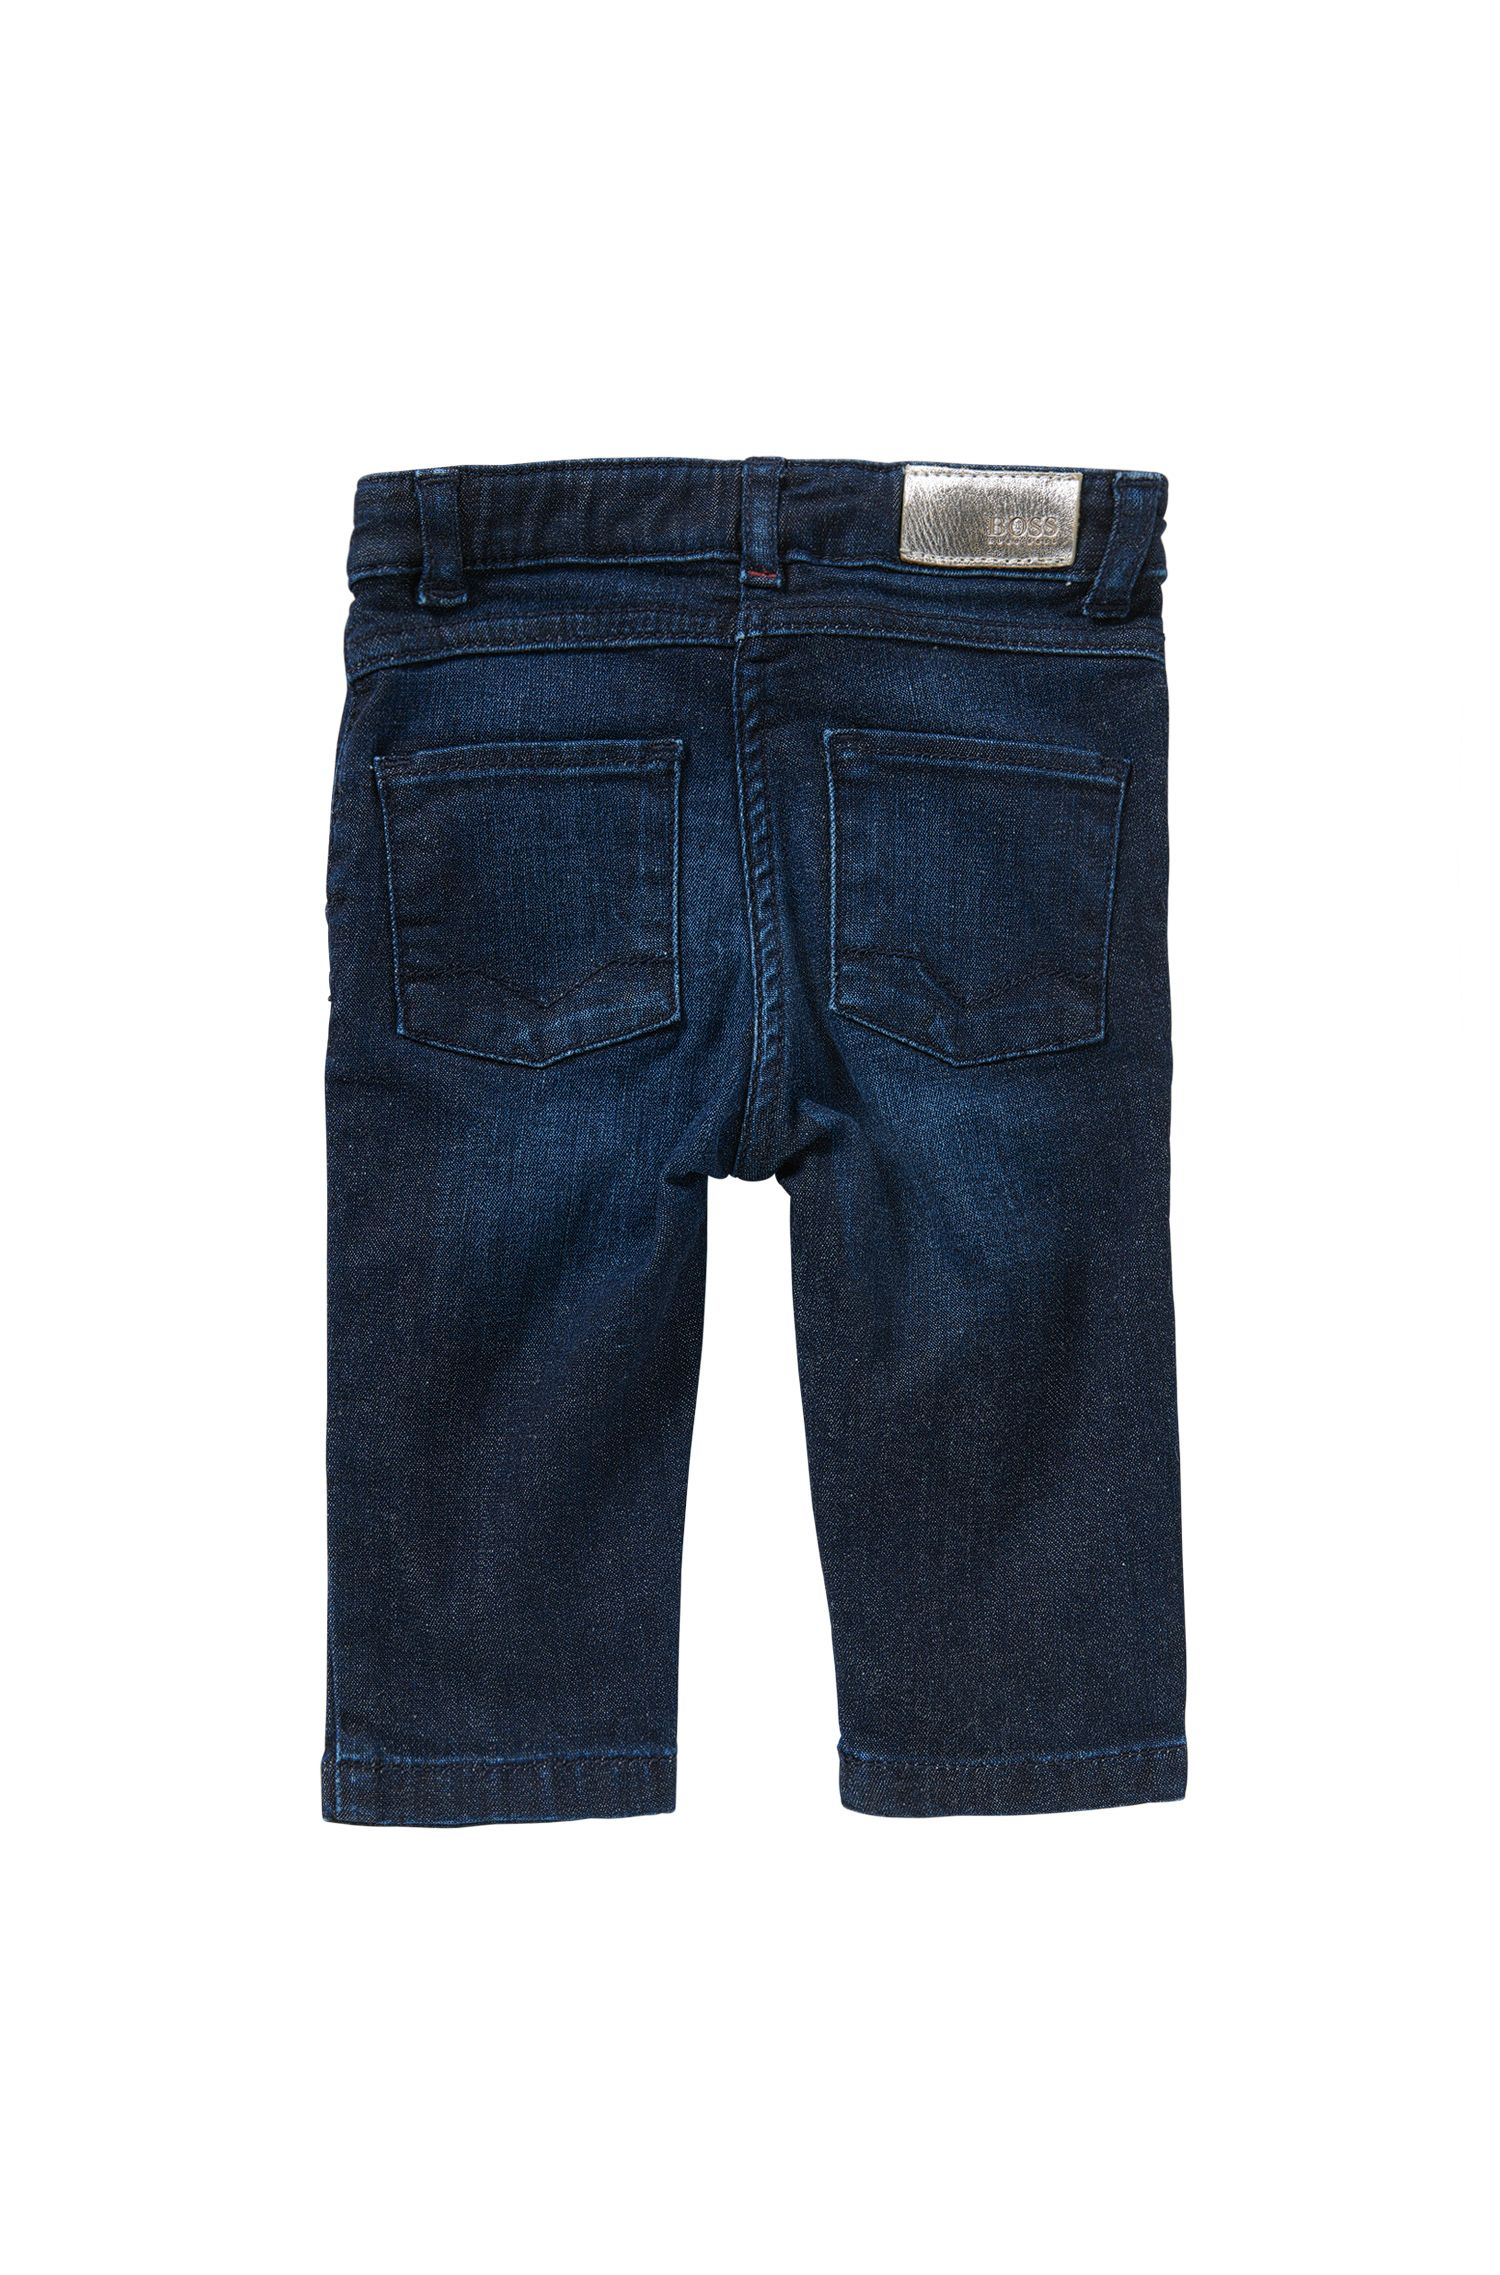 Slim-Fit Baby-Jeans aus Baumwoll-Mix: 'J04234'